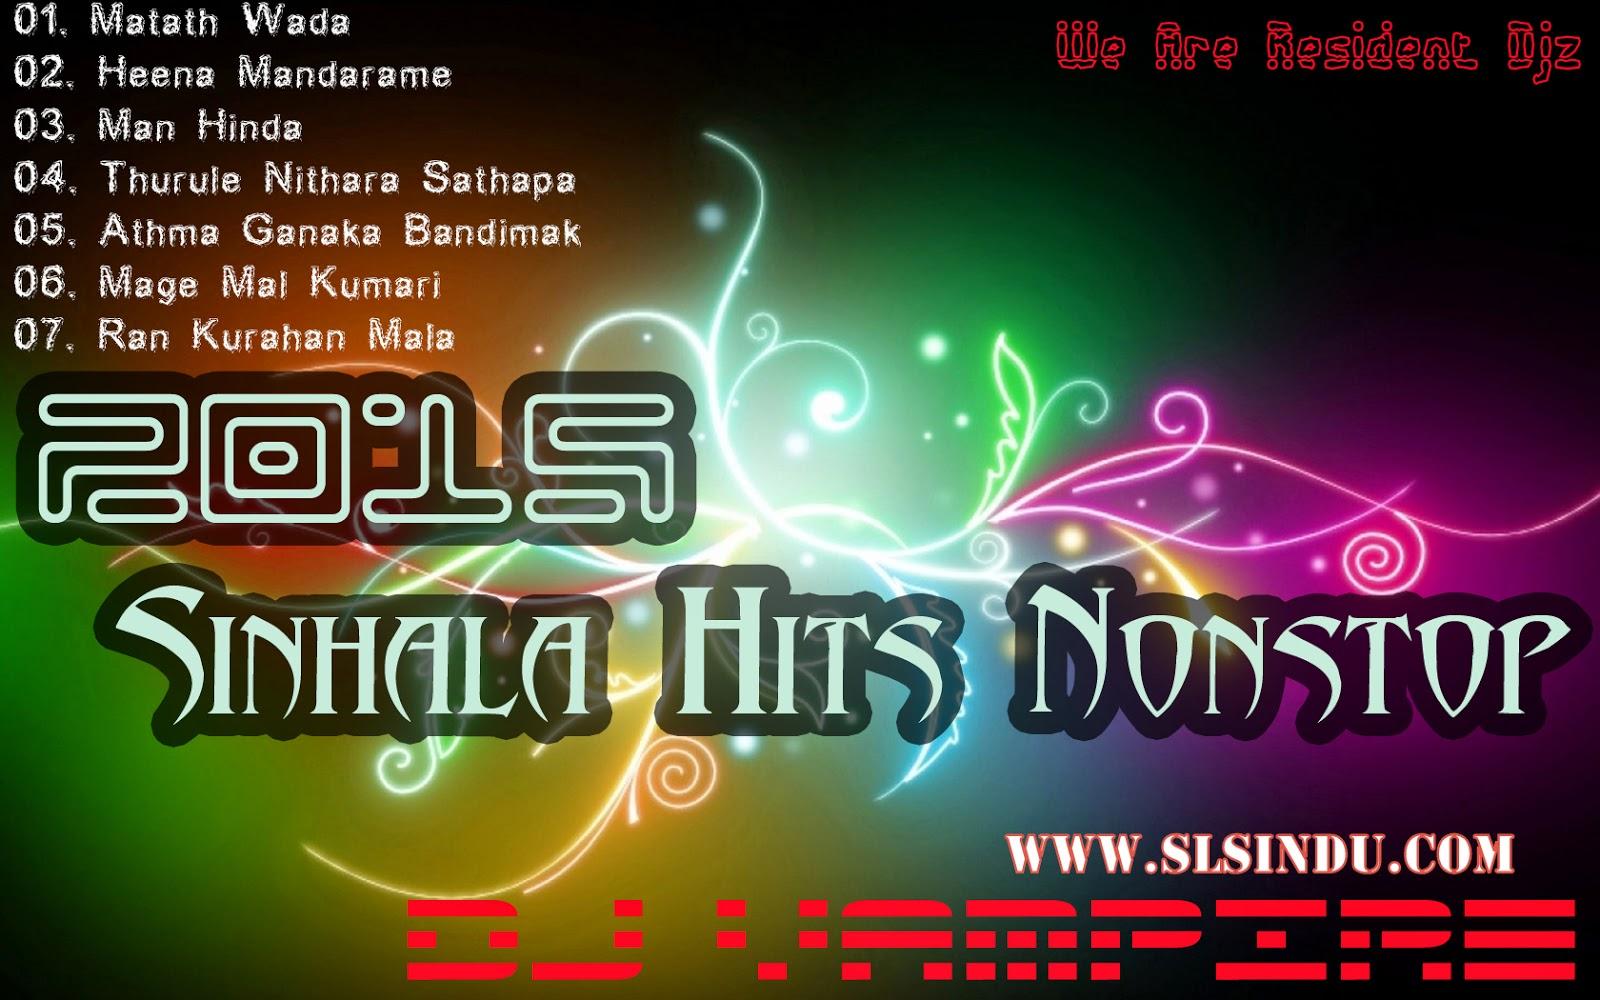 Sinhala New Nonstop Mp3